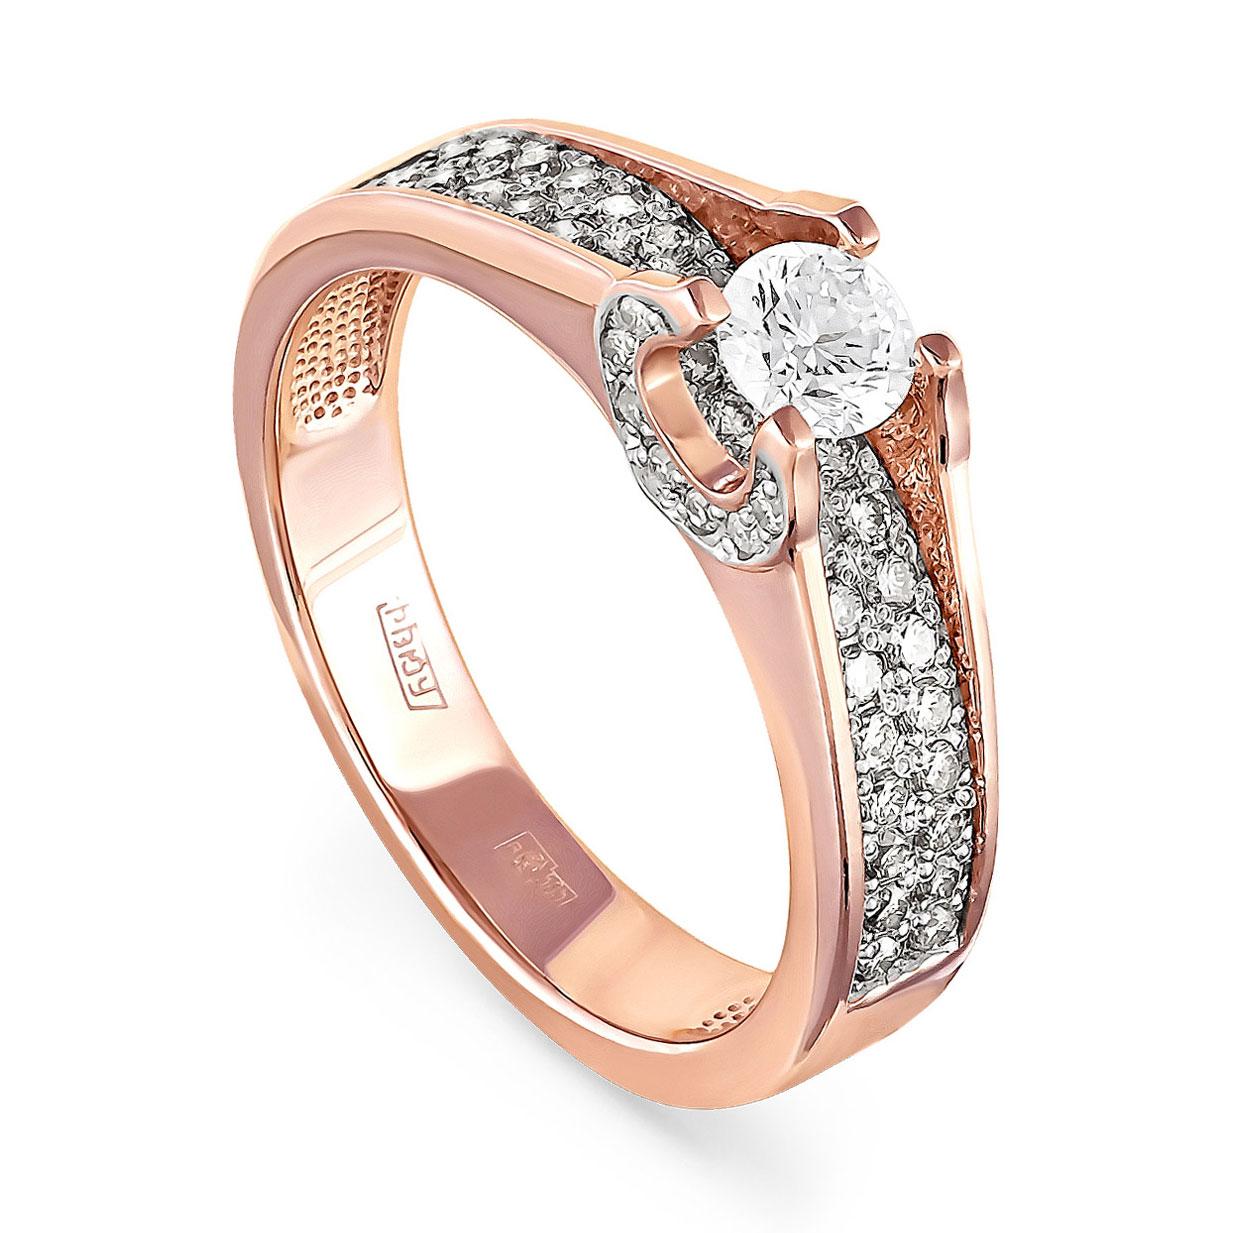 Золотое кольцо Бриллиант арт. 1-0129-1000 1-0129-1000